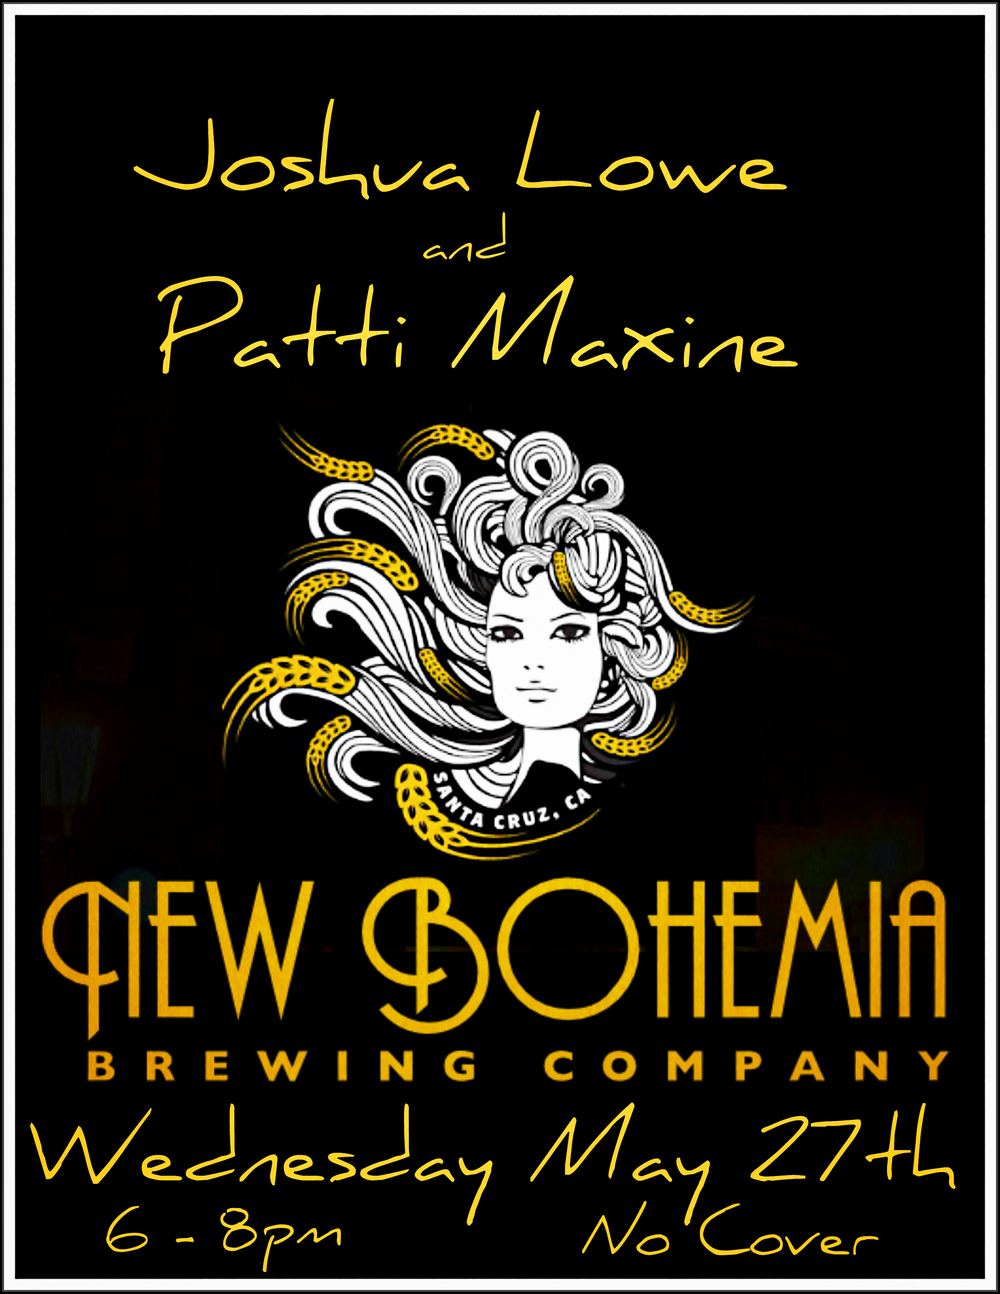 New Bohemia 5-27-15.jpg